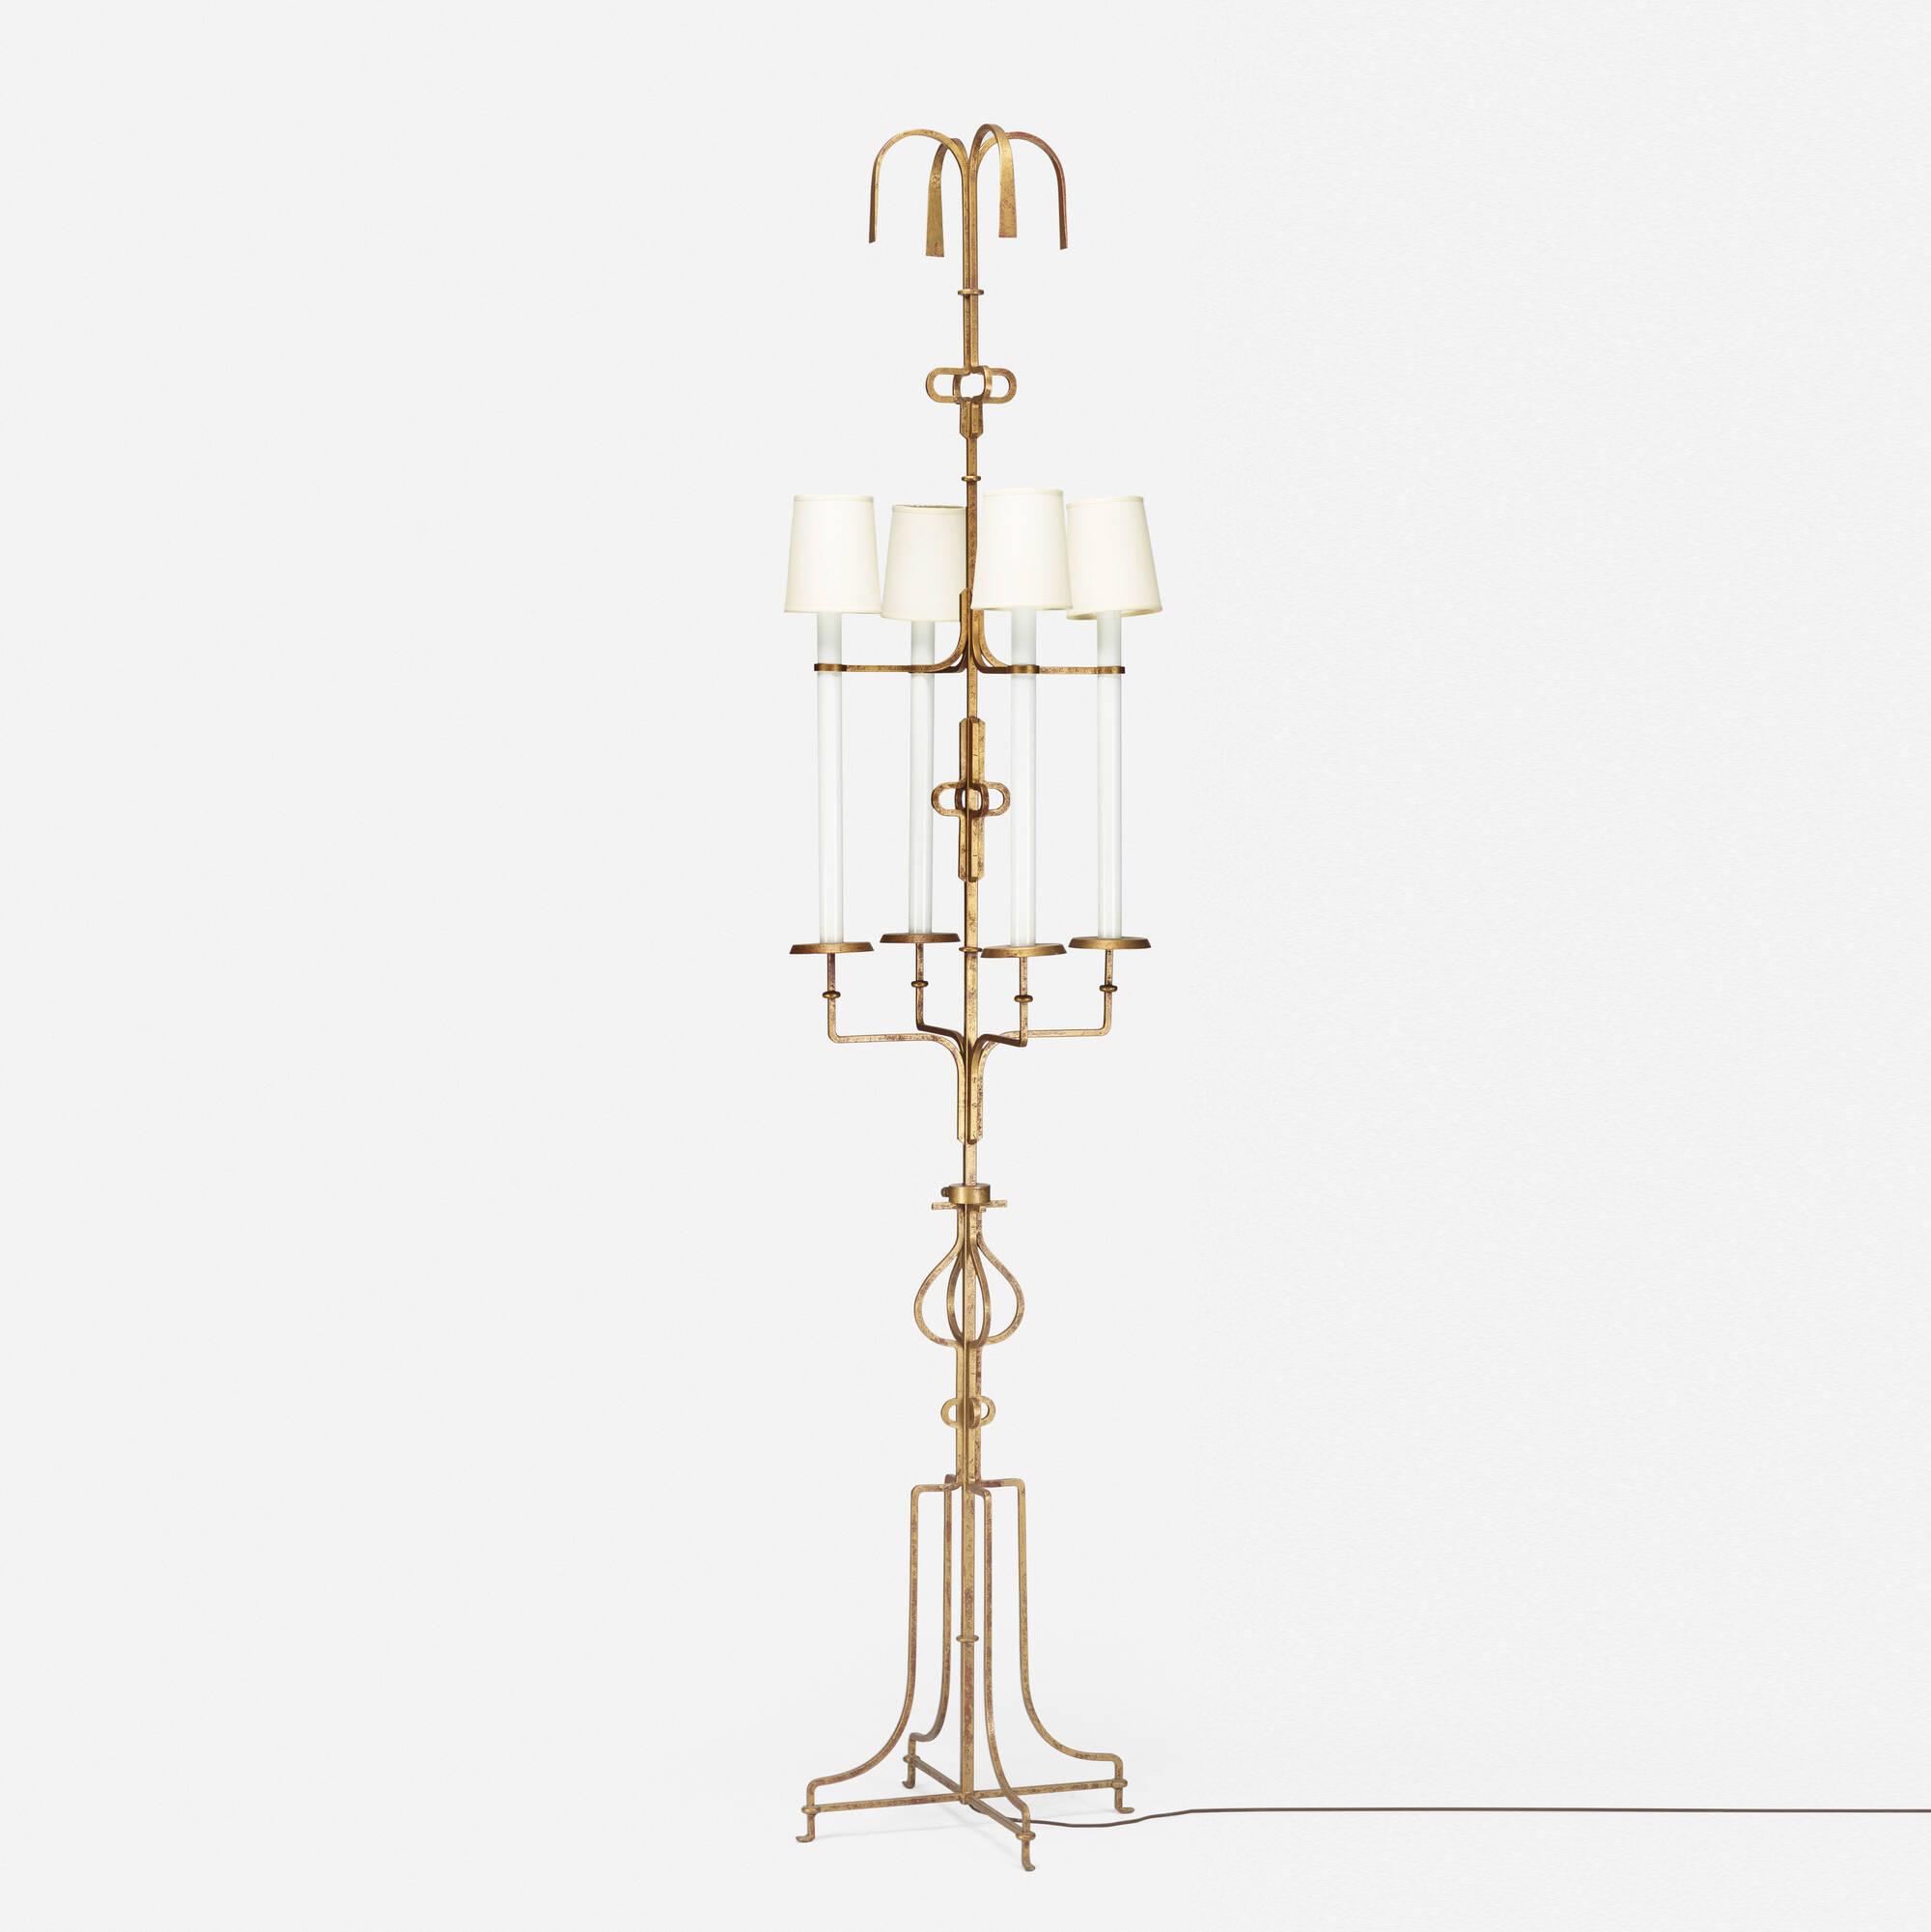 132: Tommi Parzinger / floor lamp (1 of 2)